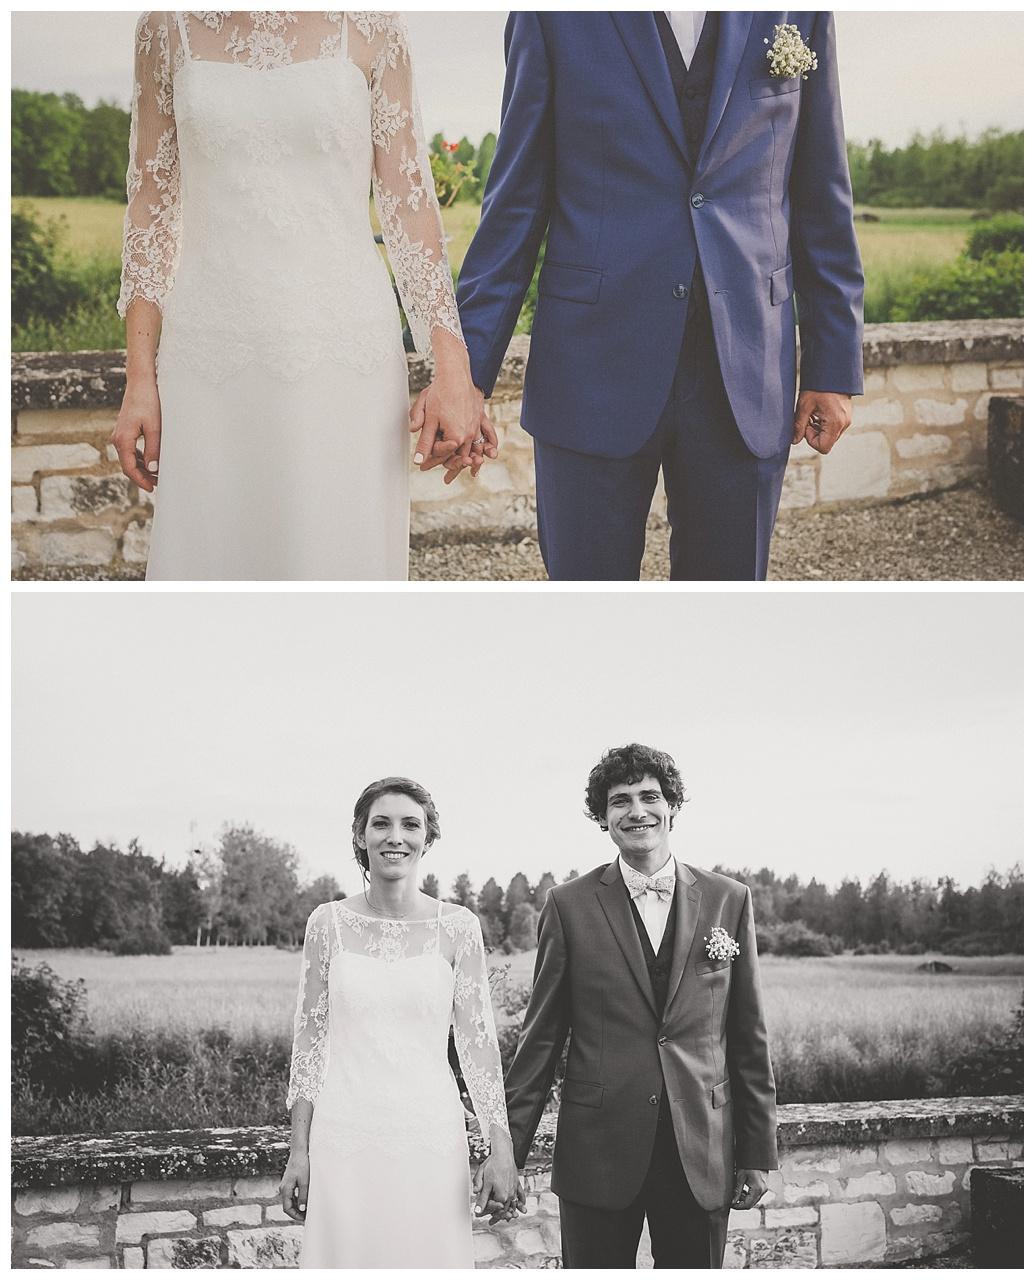 mariage-naturel-domaine-de-vermoise-troyes_0206